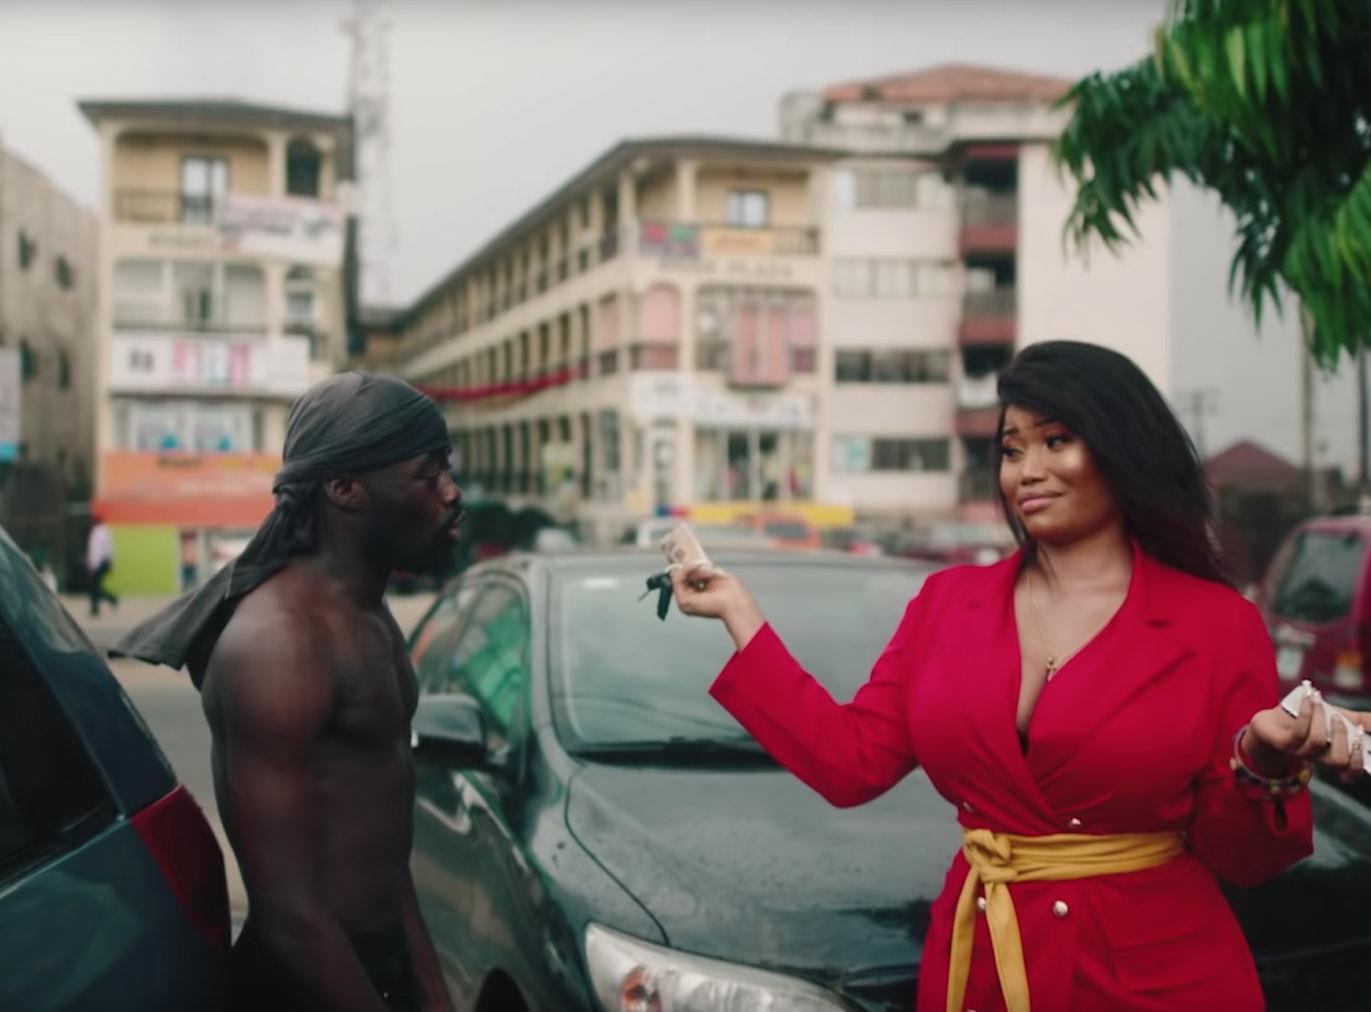 Burna Boy unveils emotional music video 'Dangote'